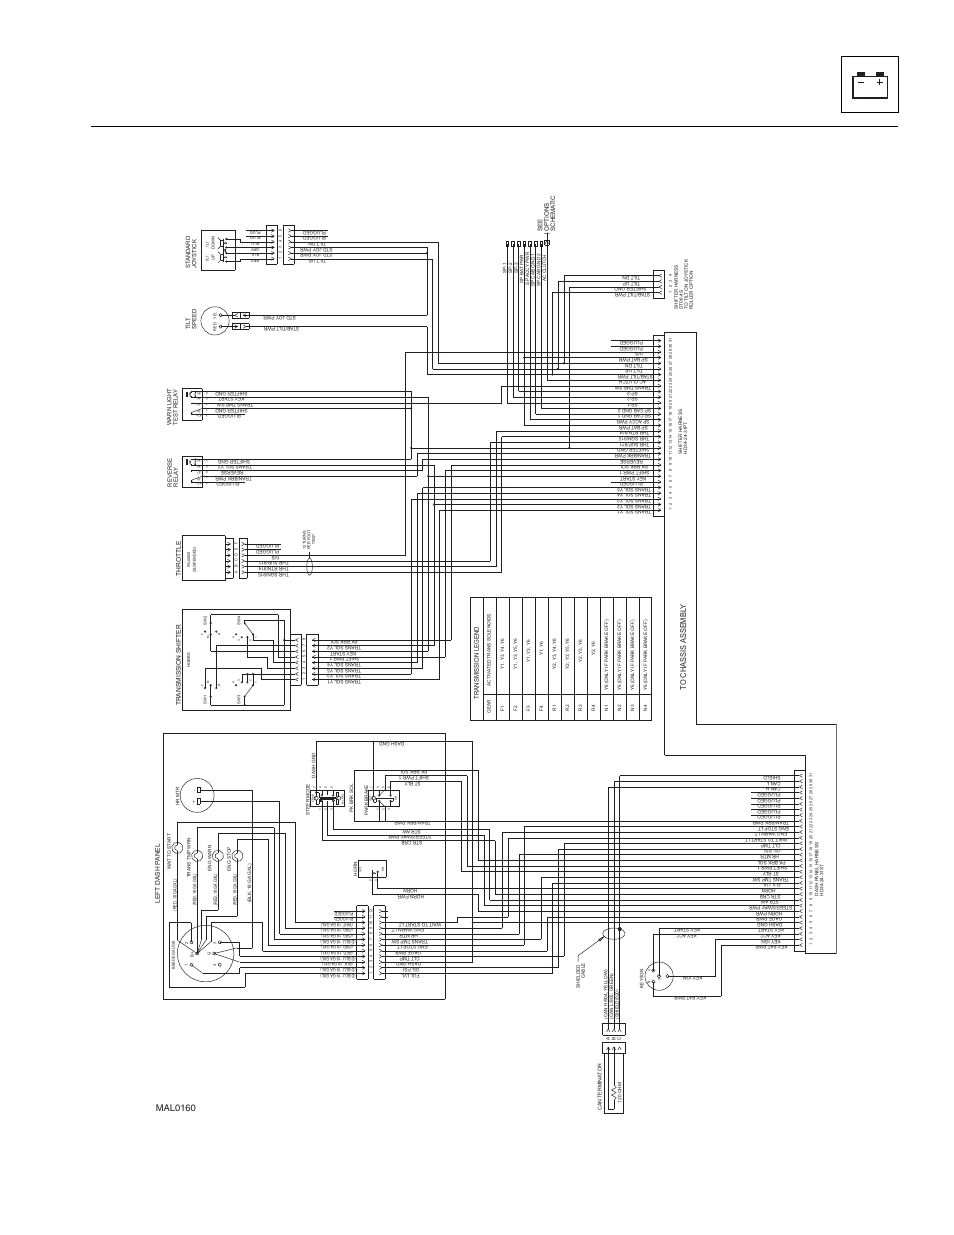 ... appealing jlg scissor lift wiring diagram pictures best image jlg g12  55a service manual page153 jlg ...